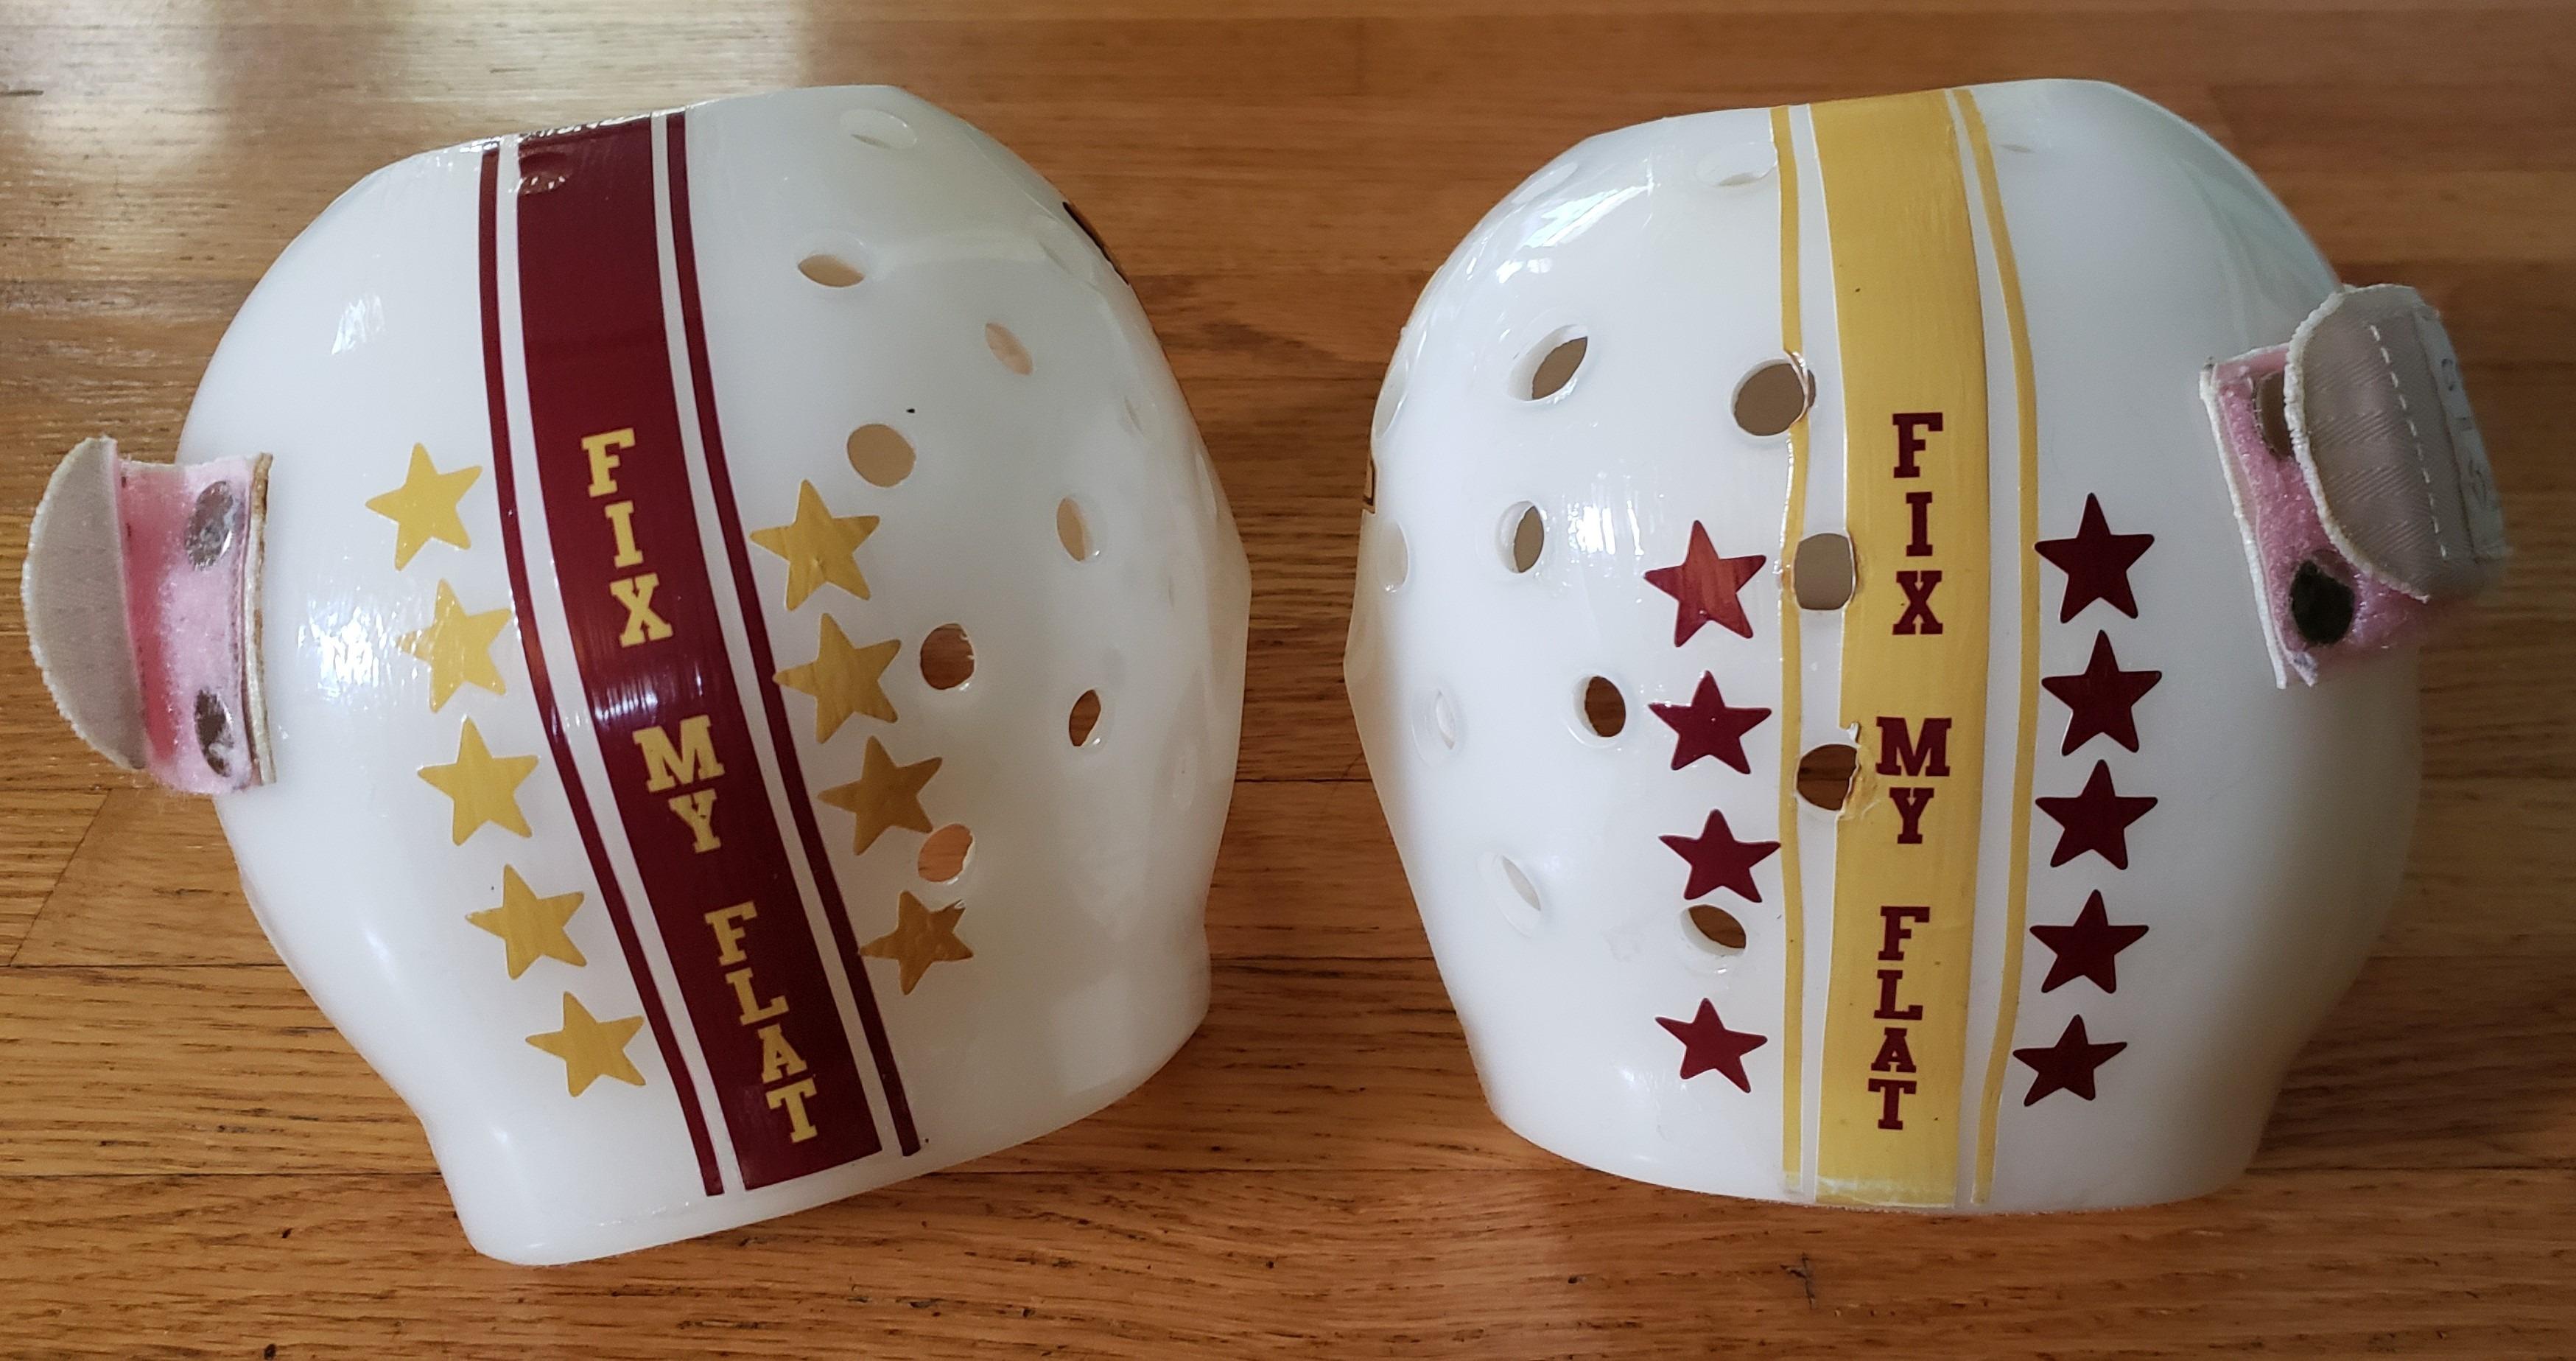 University of Minnesota cranial bands